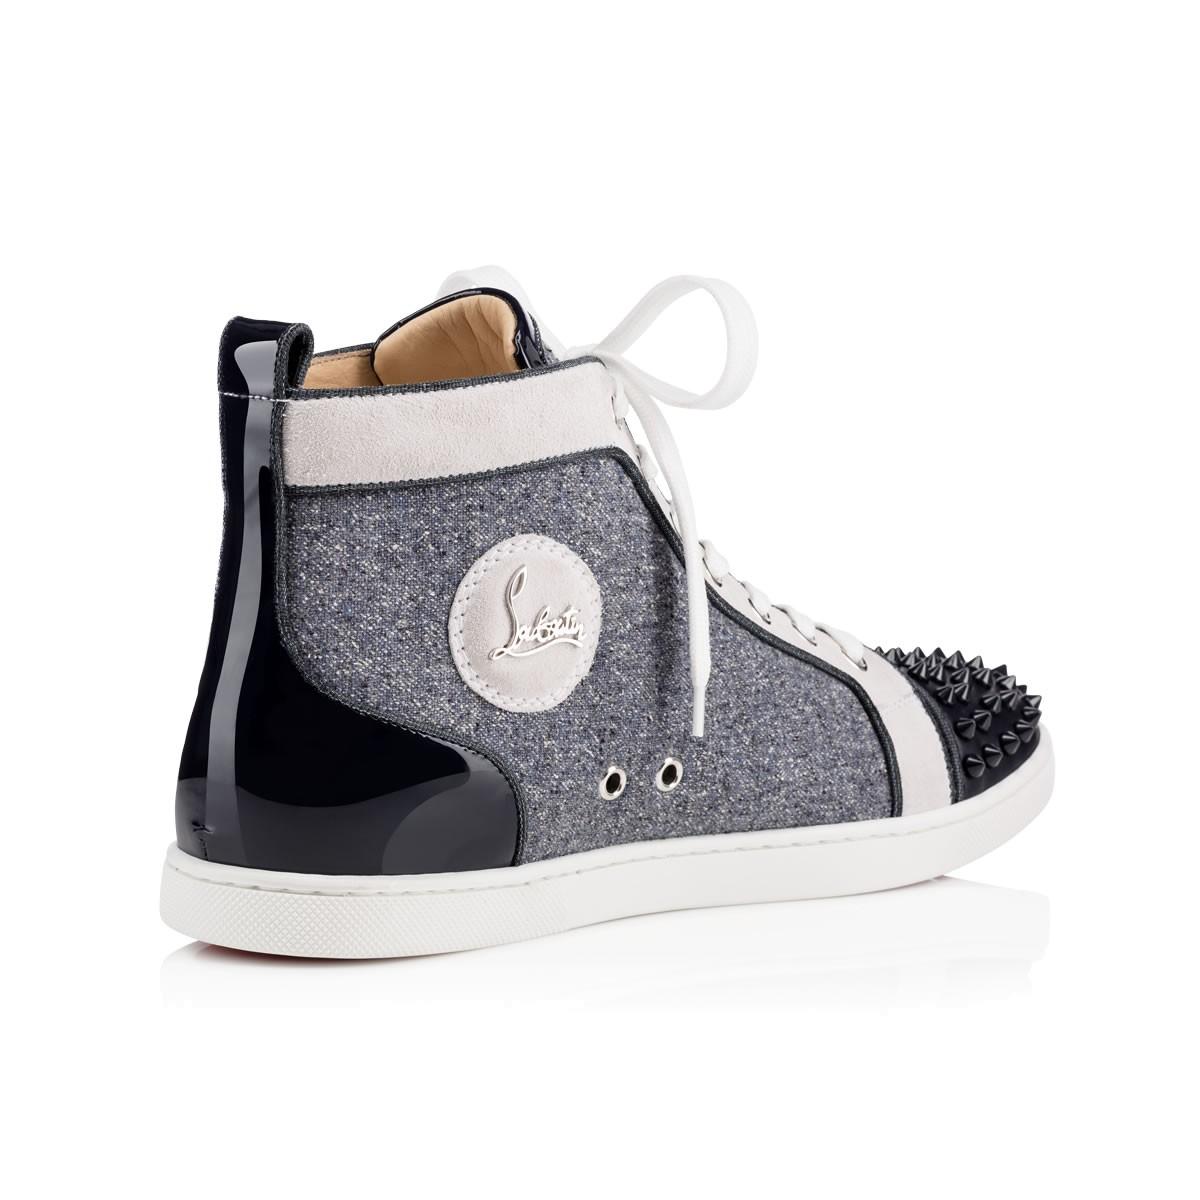 48520a15da8e ... uk men shoes nazapunta orlato flat calf jeans christian louboutin lyst  christian louboutin bip bip orlato